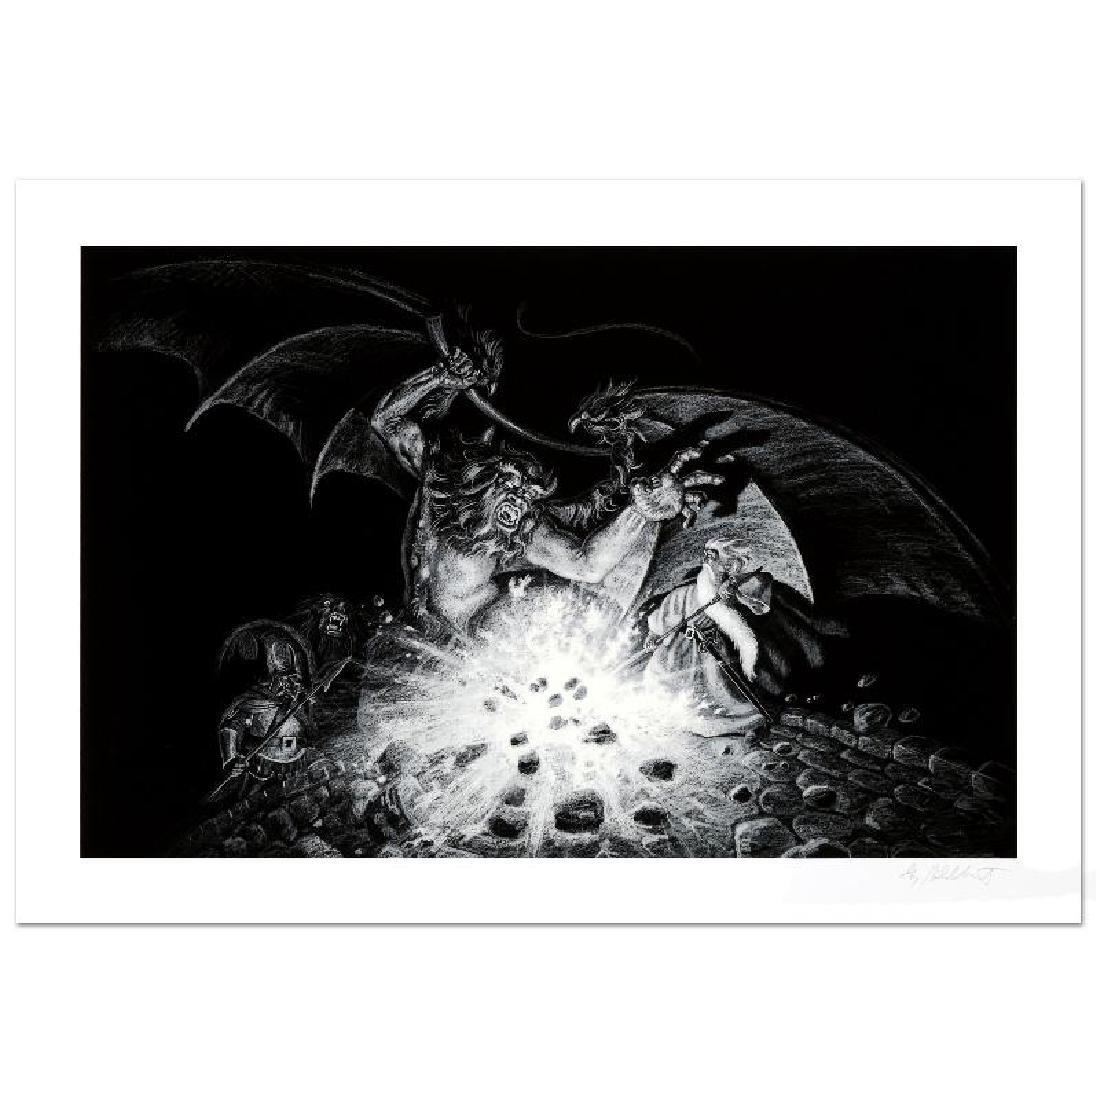 """Gandalf Versus Balrog"" Limited Edition Giclee by Greg"